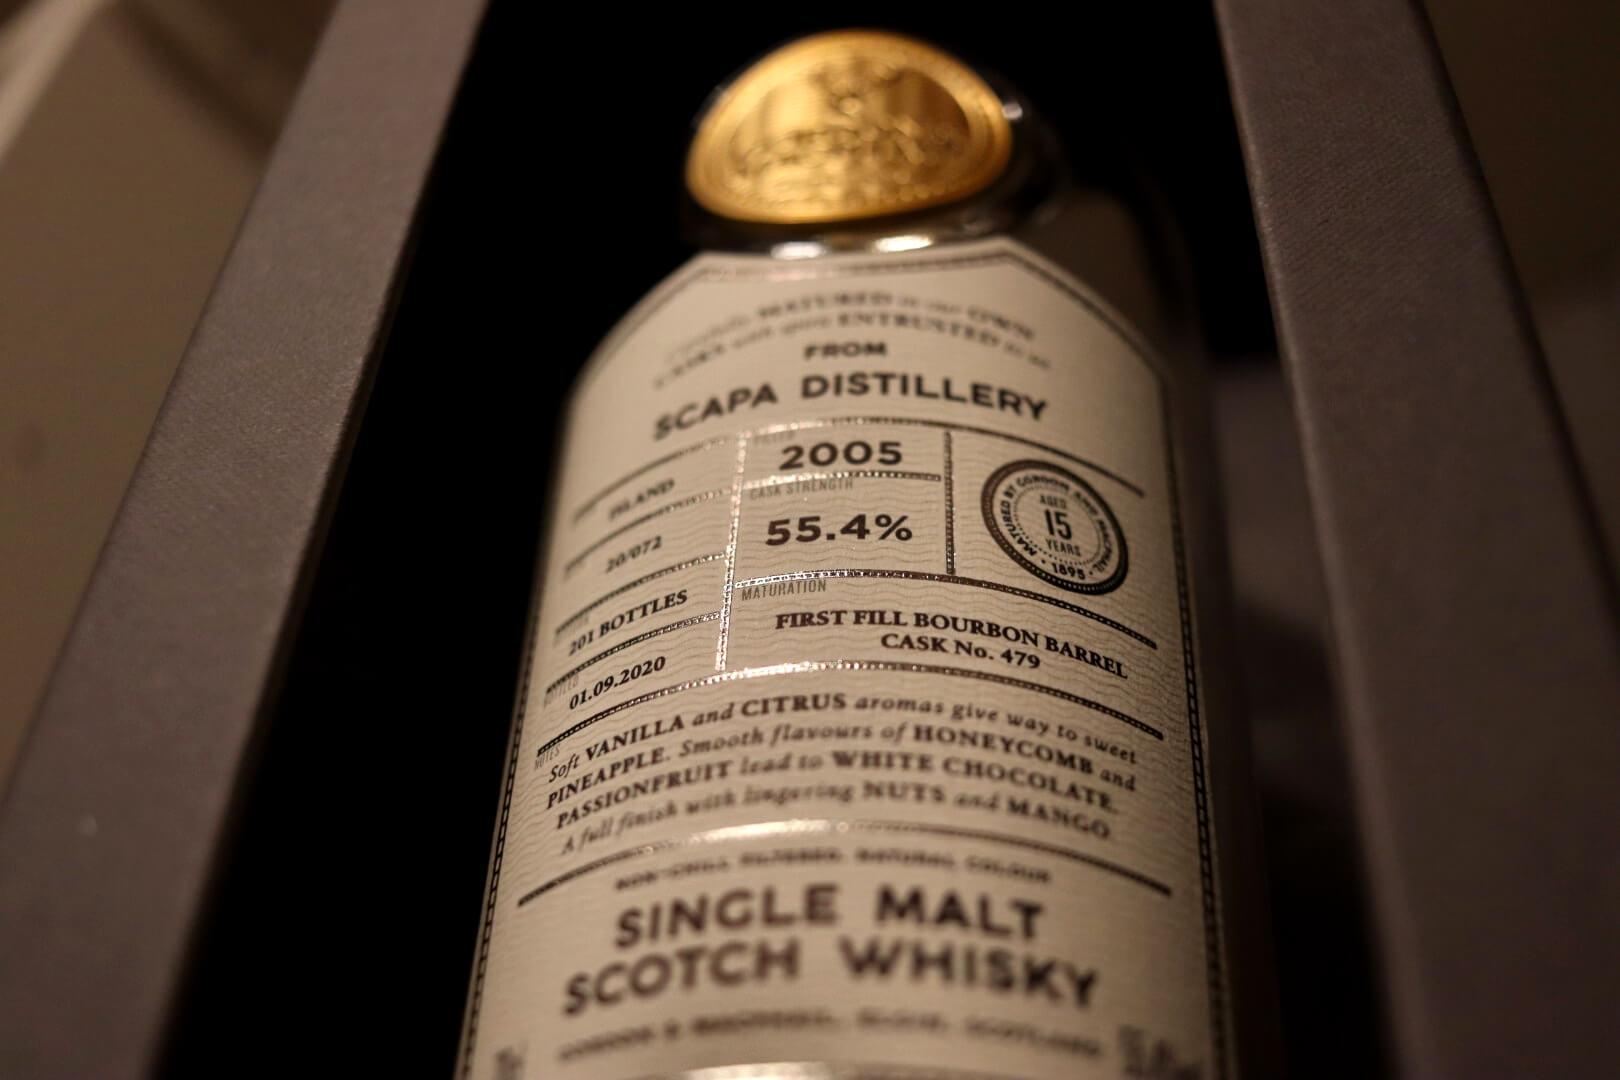 Whiskybesprechung #193: Scapa 2005 / 2020 Gordon & MacPhail